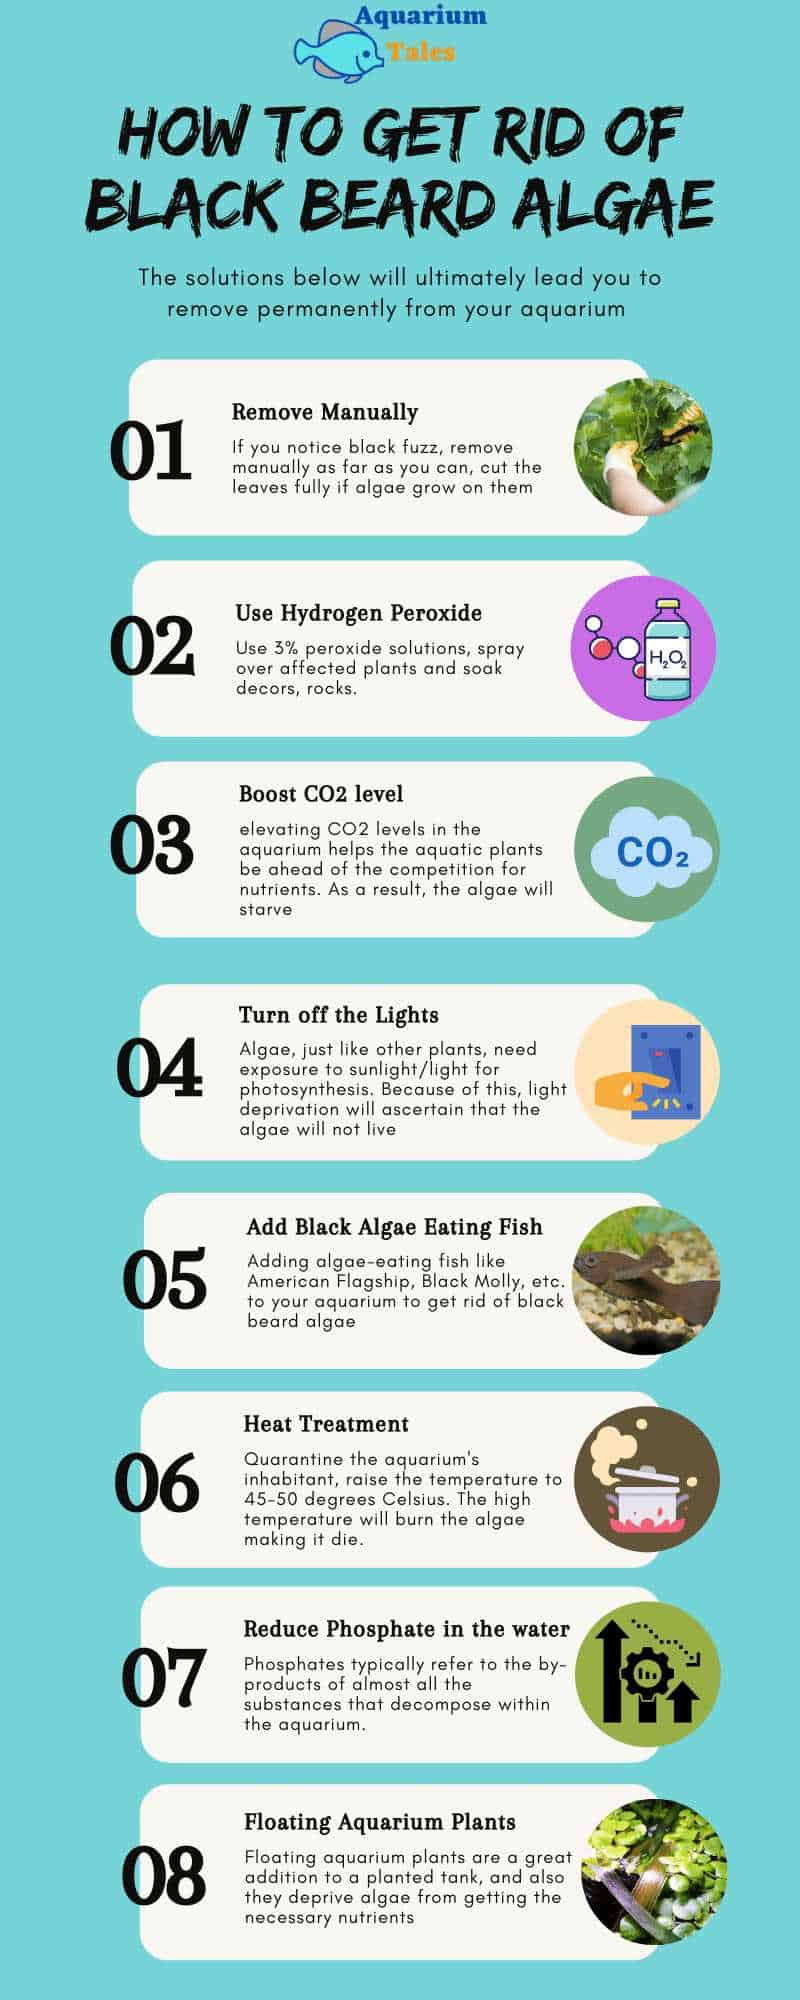 How to Get Rid of Black Beard Algae (infographic)